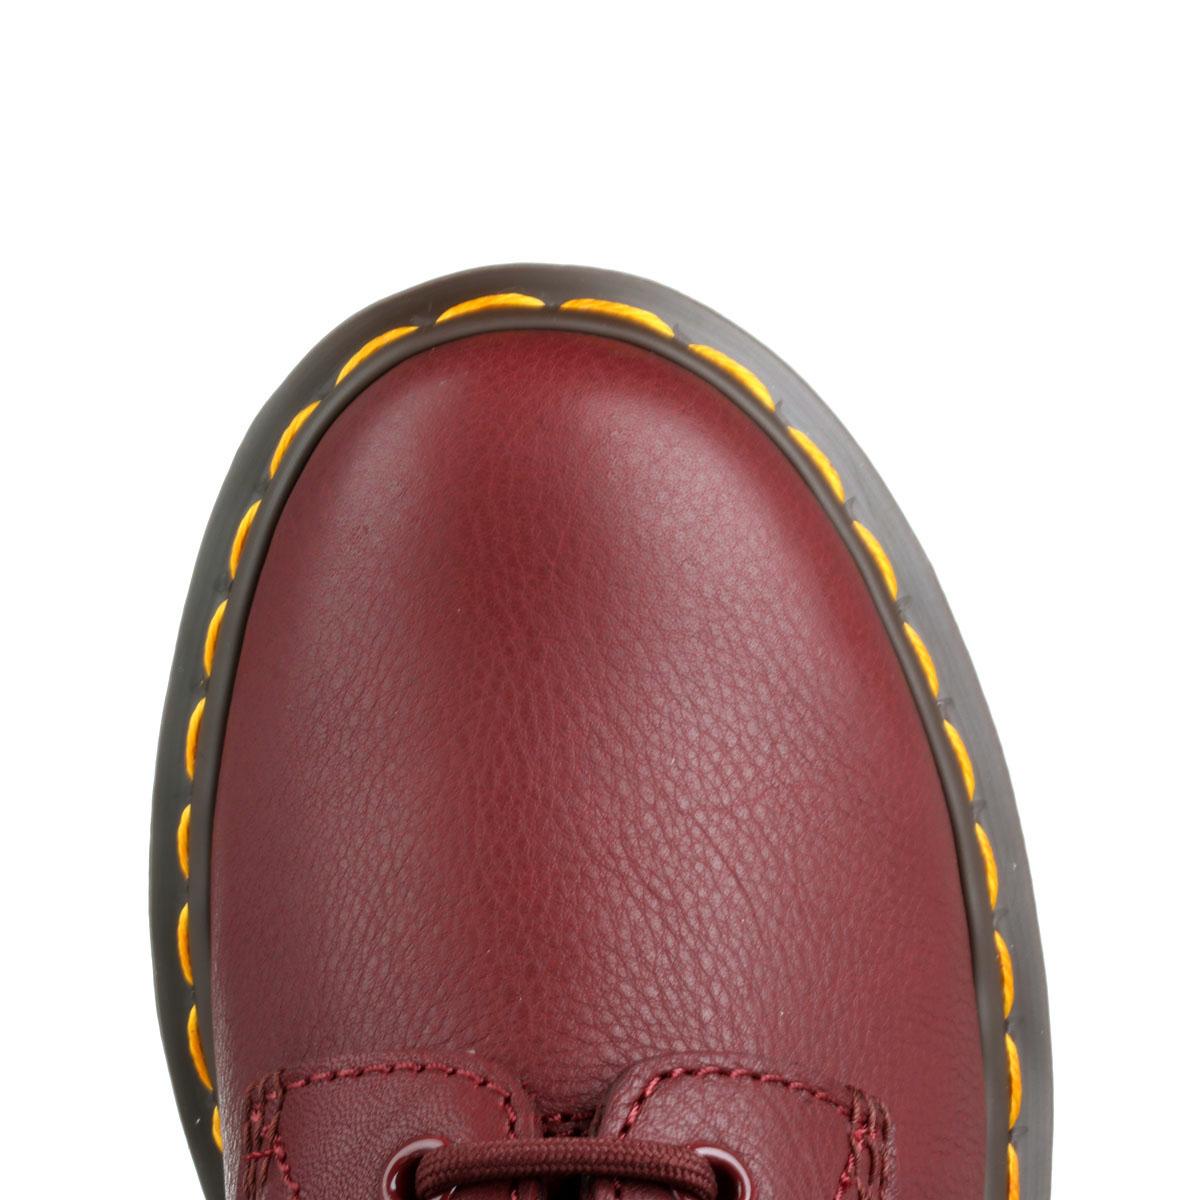 Dr. Martens Damenschuhe Pascal Virginia Ankle Stiefel, Schuhes 4 Colours, Leder, Winter Schuhes Stiefel, 6379ea